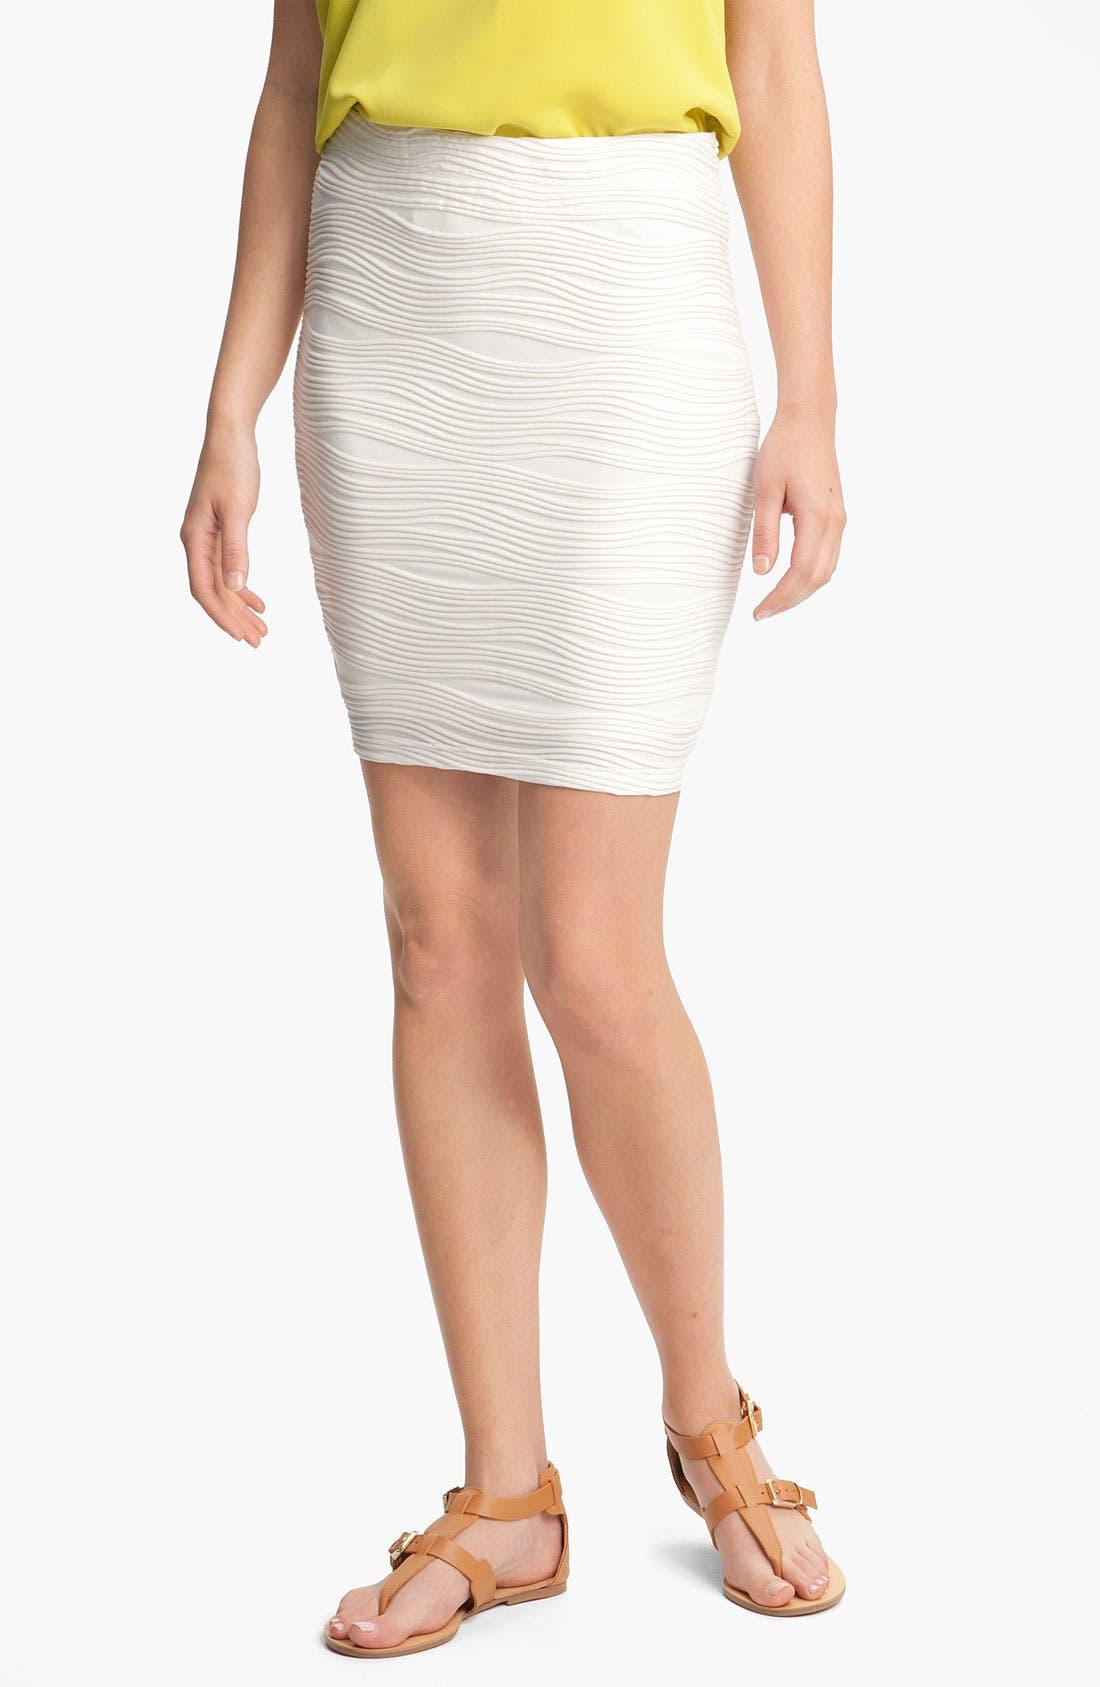 Alternate Image 1 Selected - Lily White Textured Bandage Skirt (Juniors)